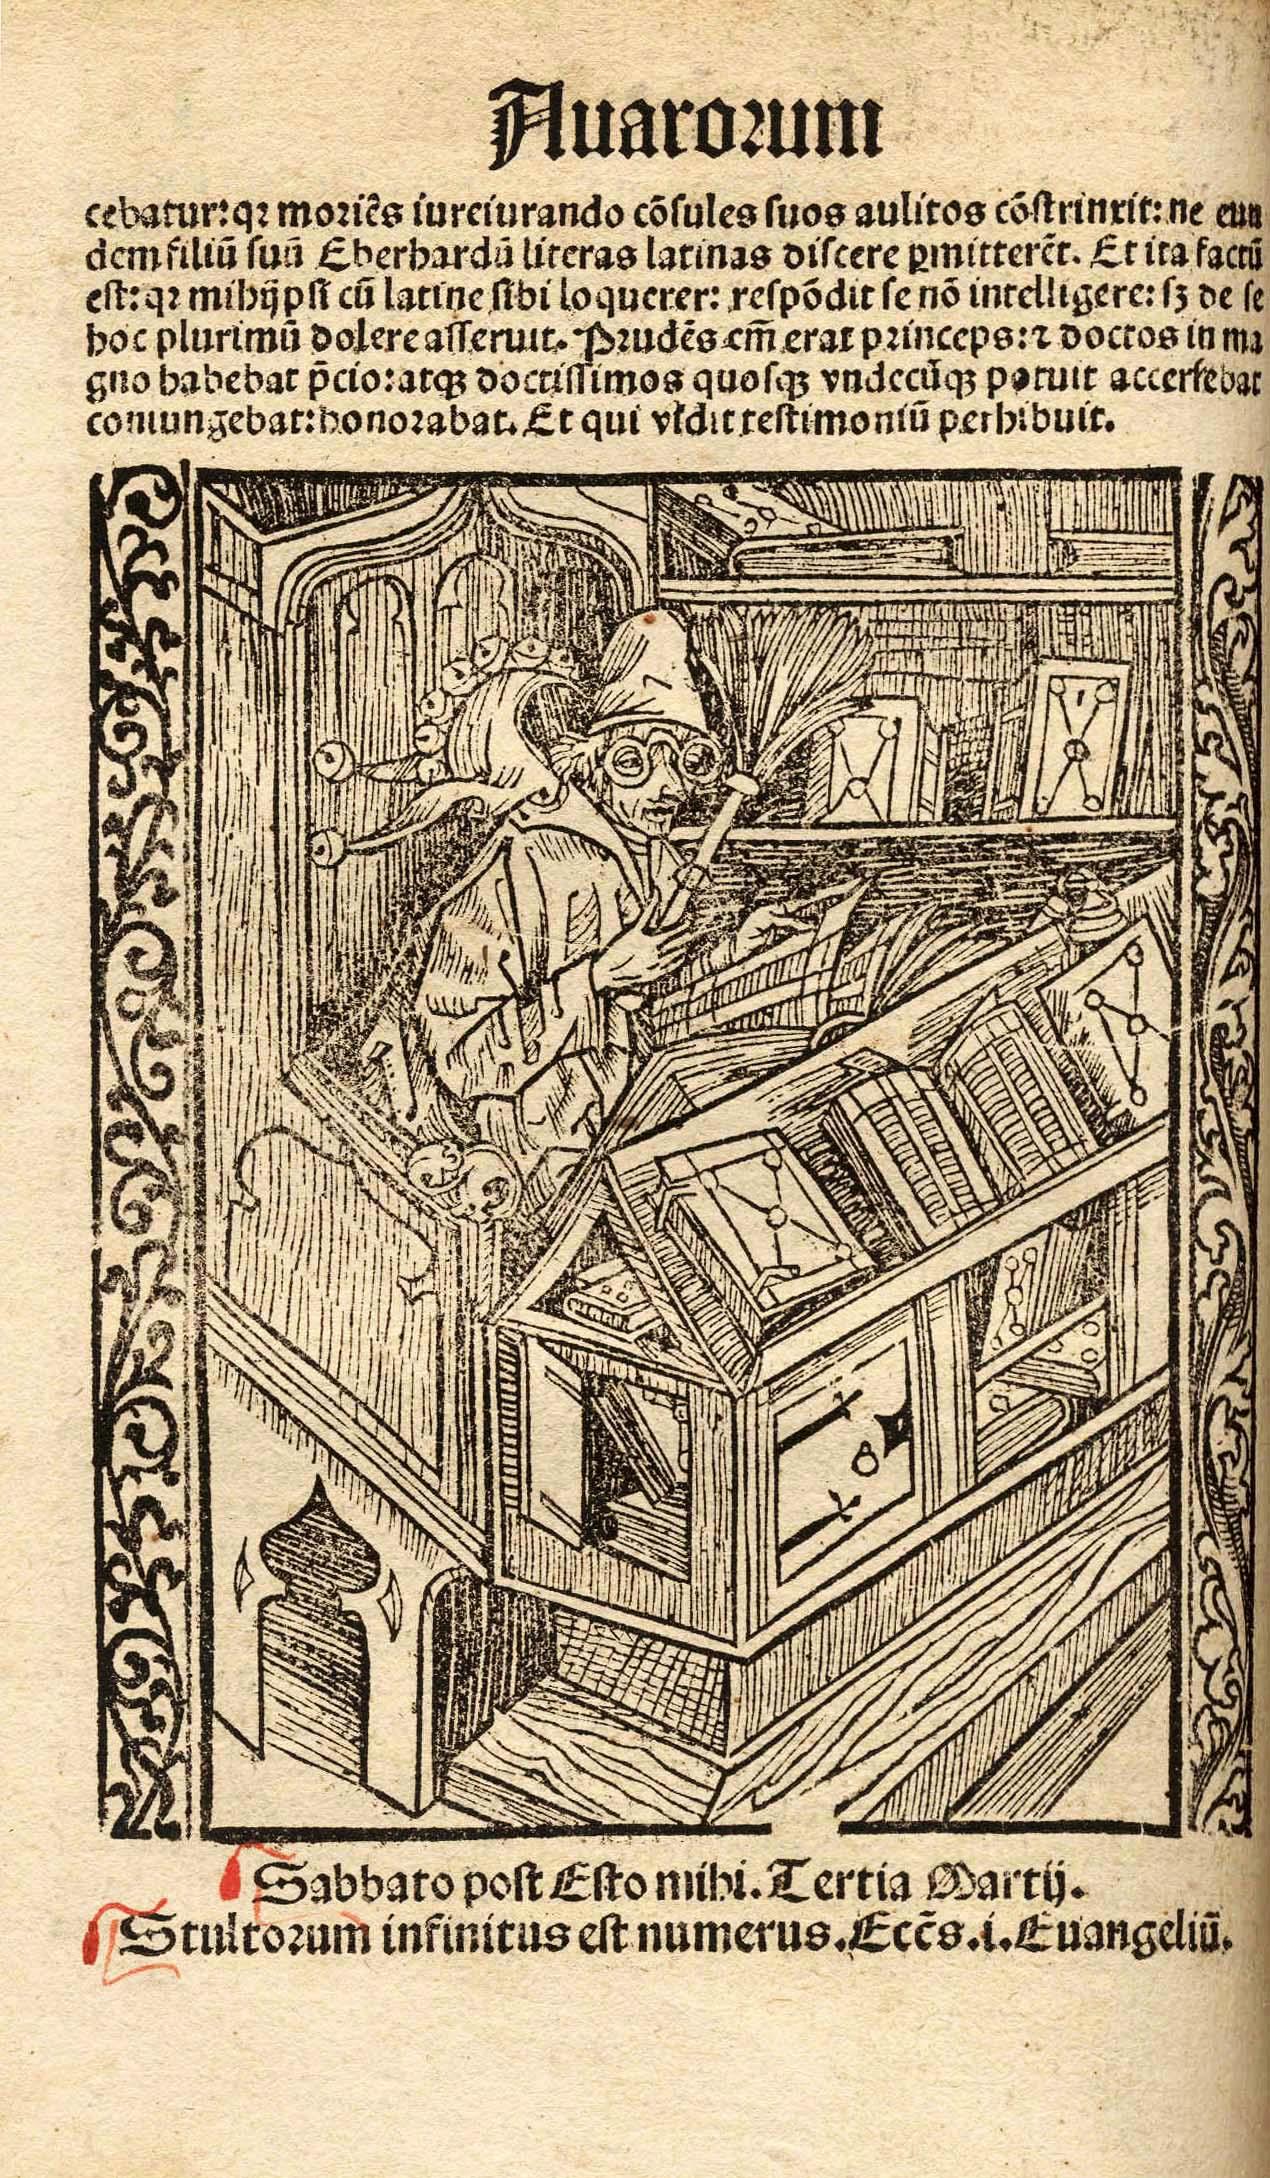 Johannes Geiler von Kaysersberg, Navicula sive Speculum fatuorum. Straßburg, 1510